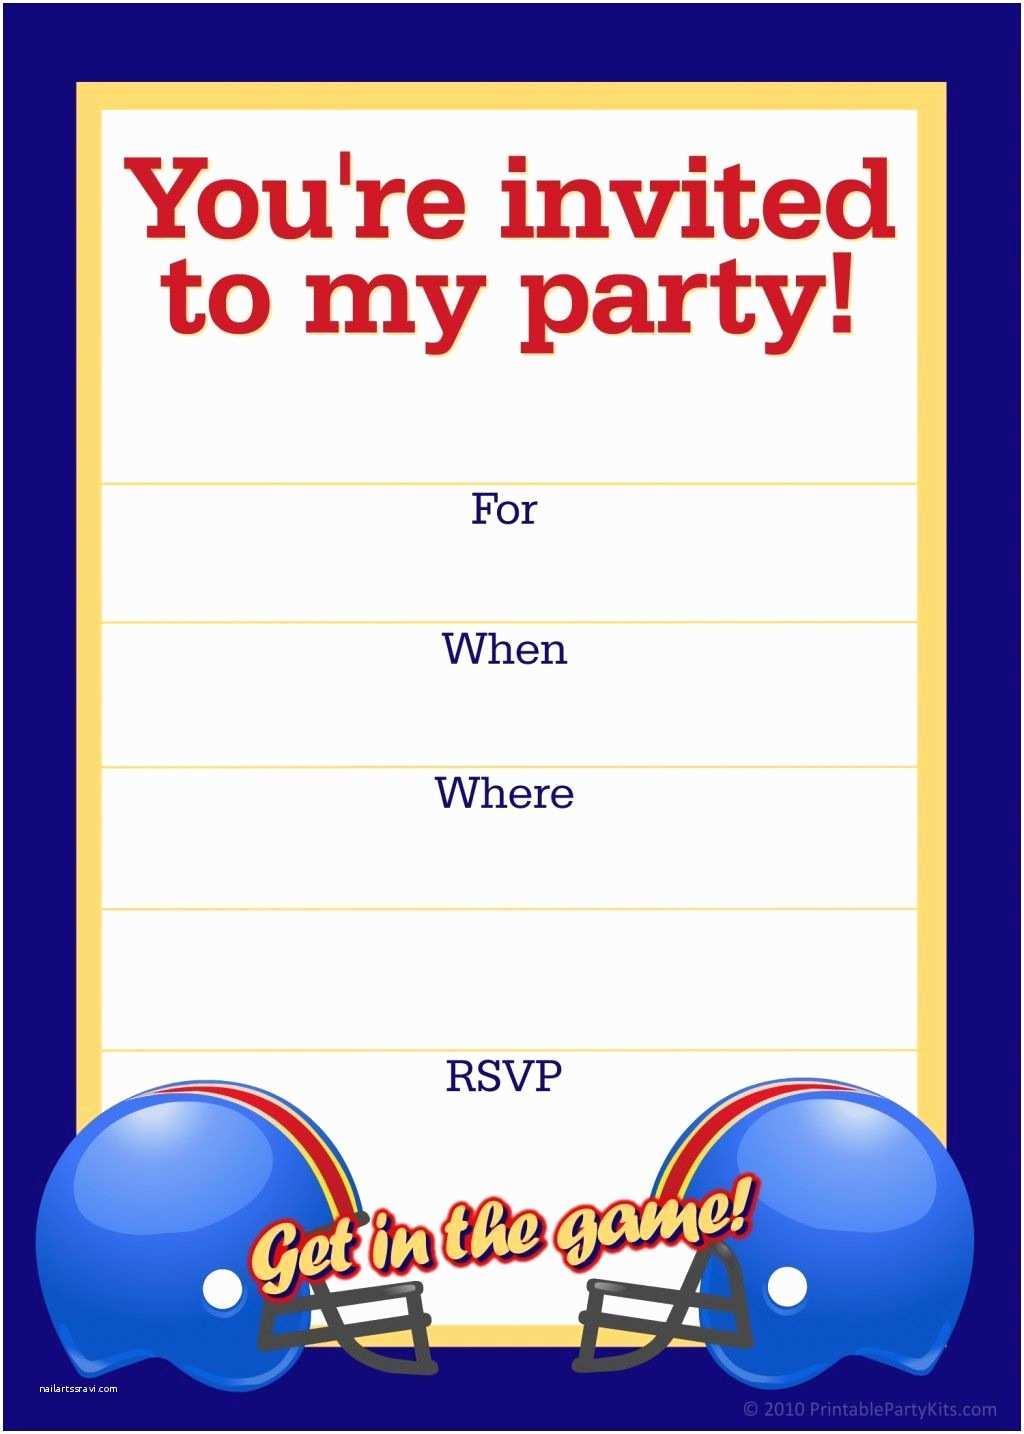 Birthday Invitation Templates Free Printable Sports Birthday Party Invitations Templates